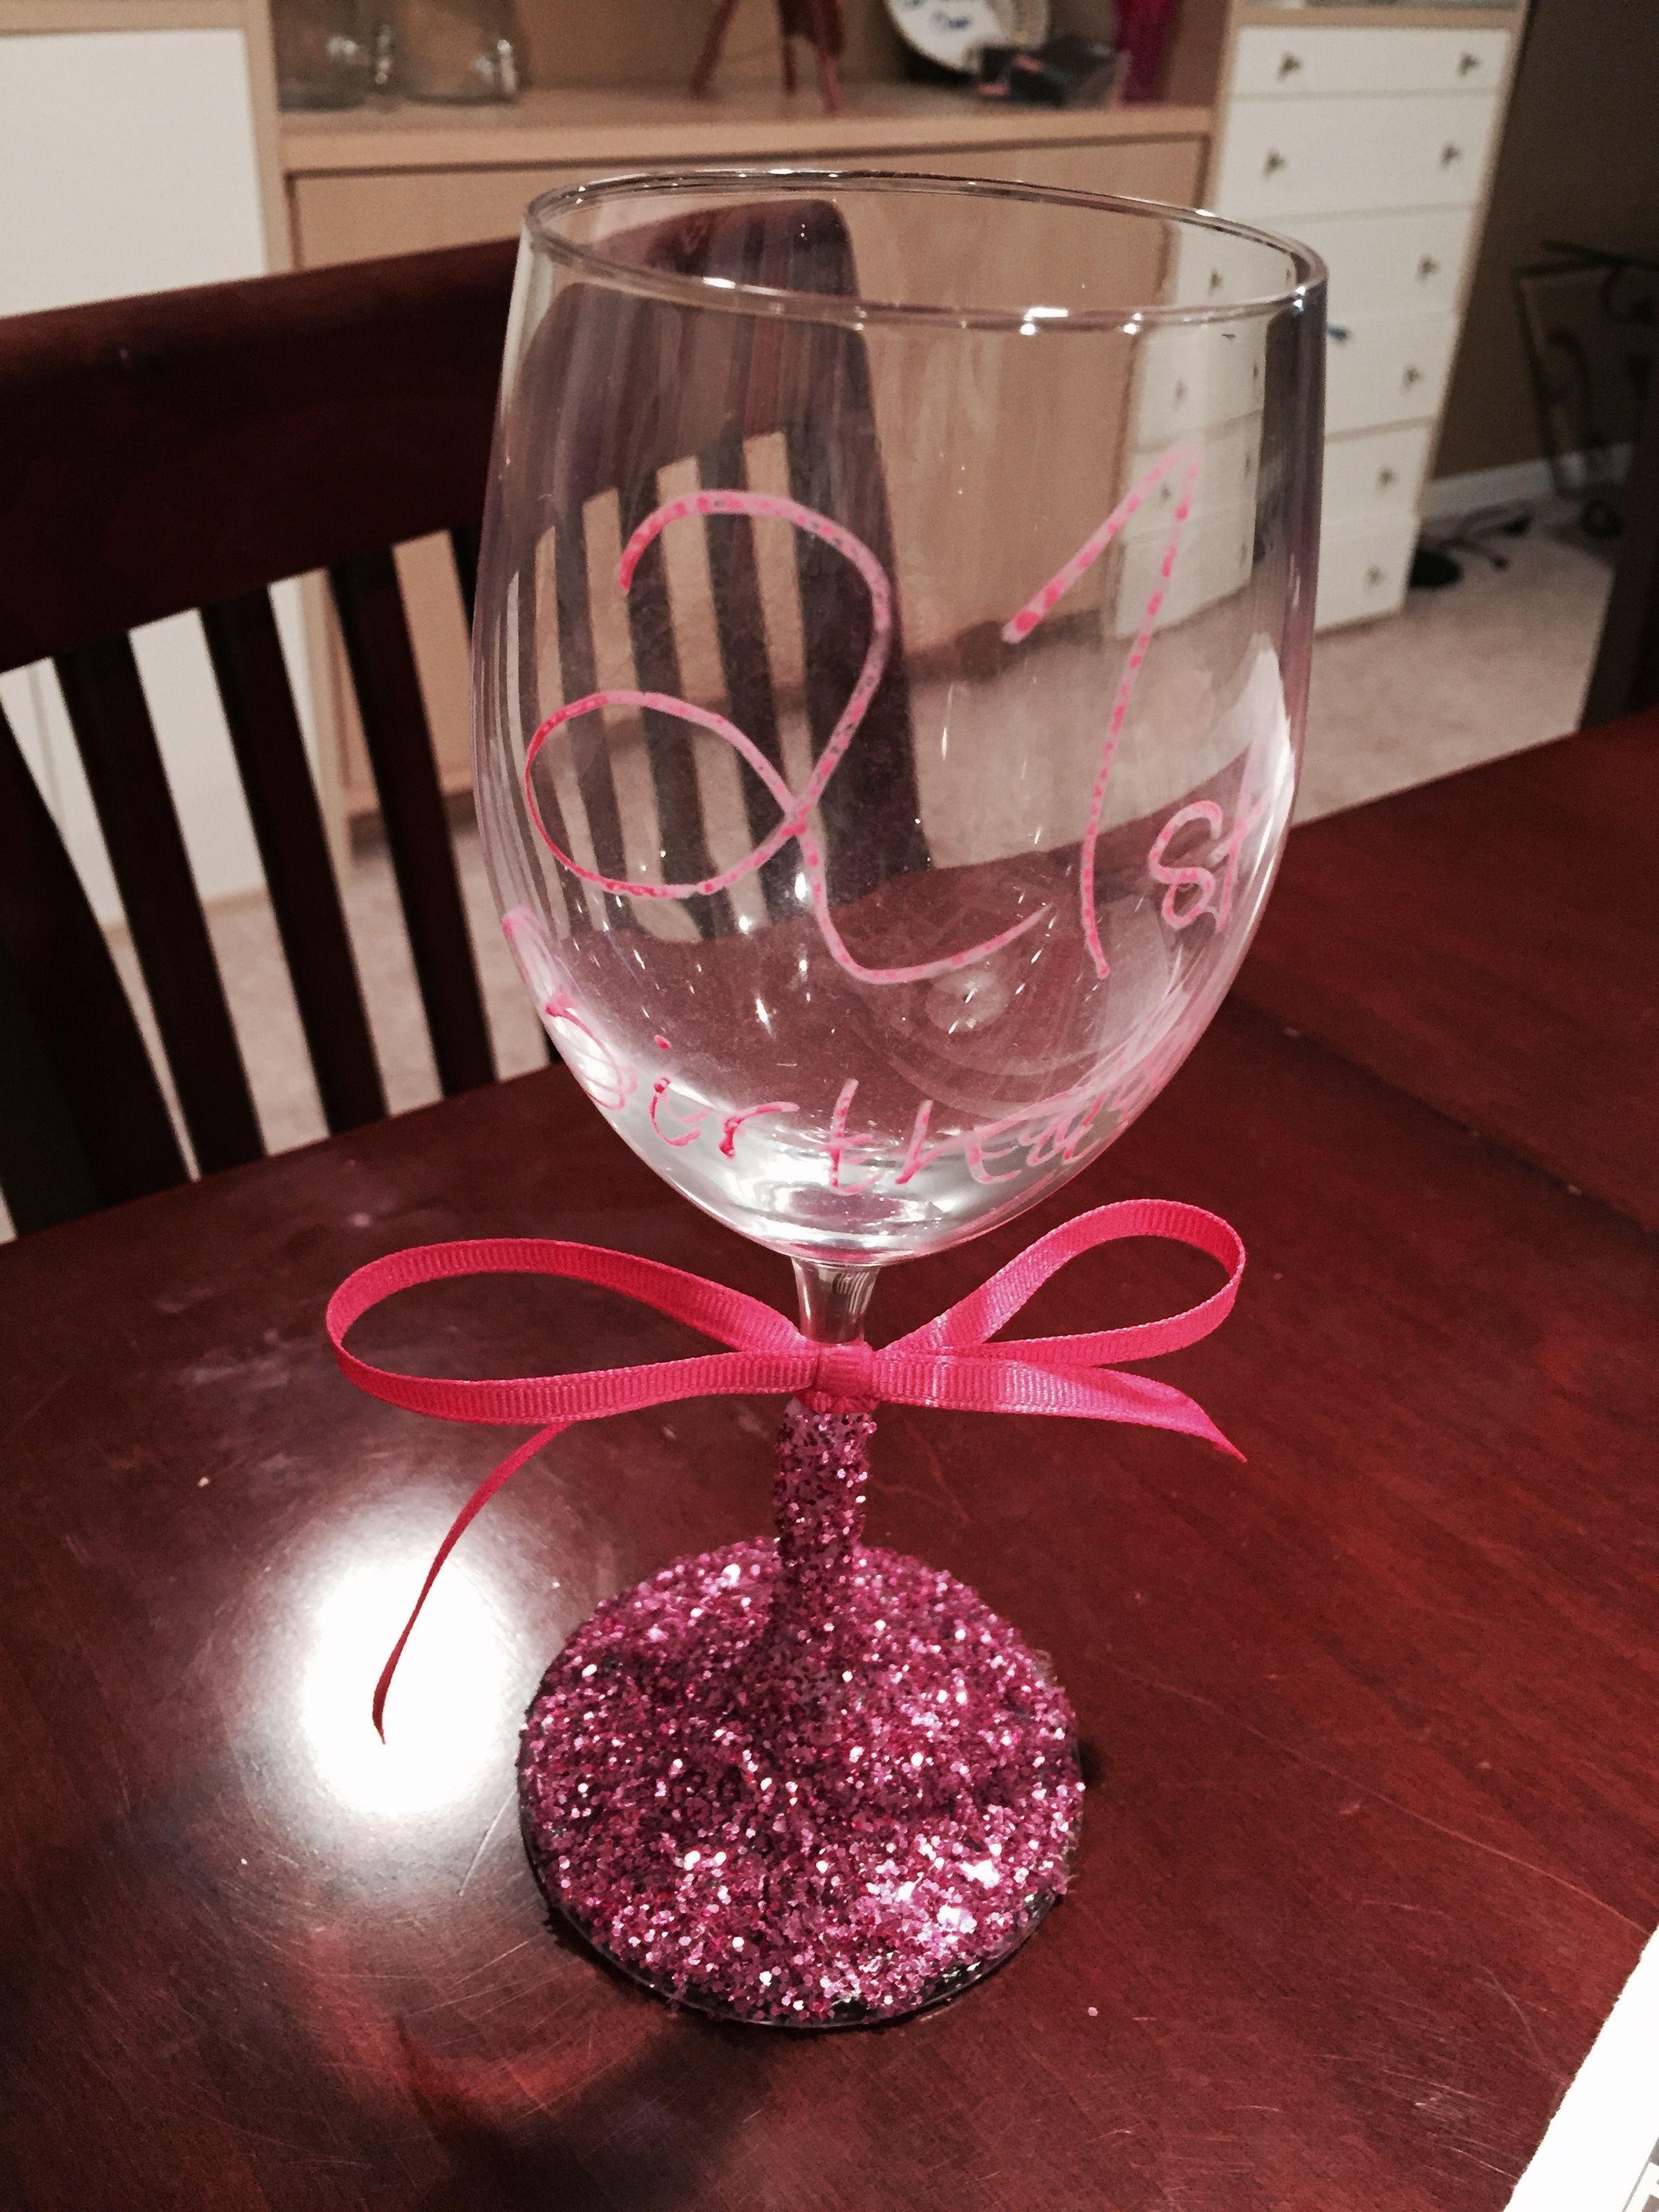 21st Birthday Wine Glass Diy 21st 21bday Cute Sparkly 21 Birthday Wine Glass Birthday Wine Birthday Wine Glass